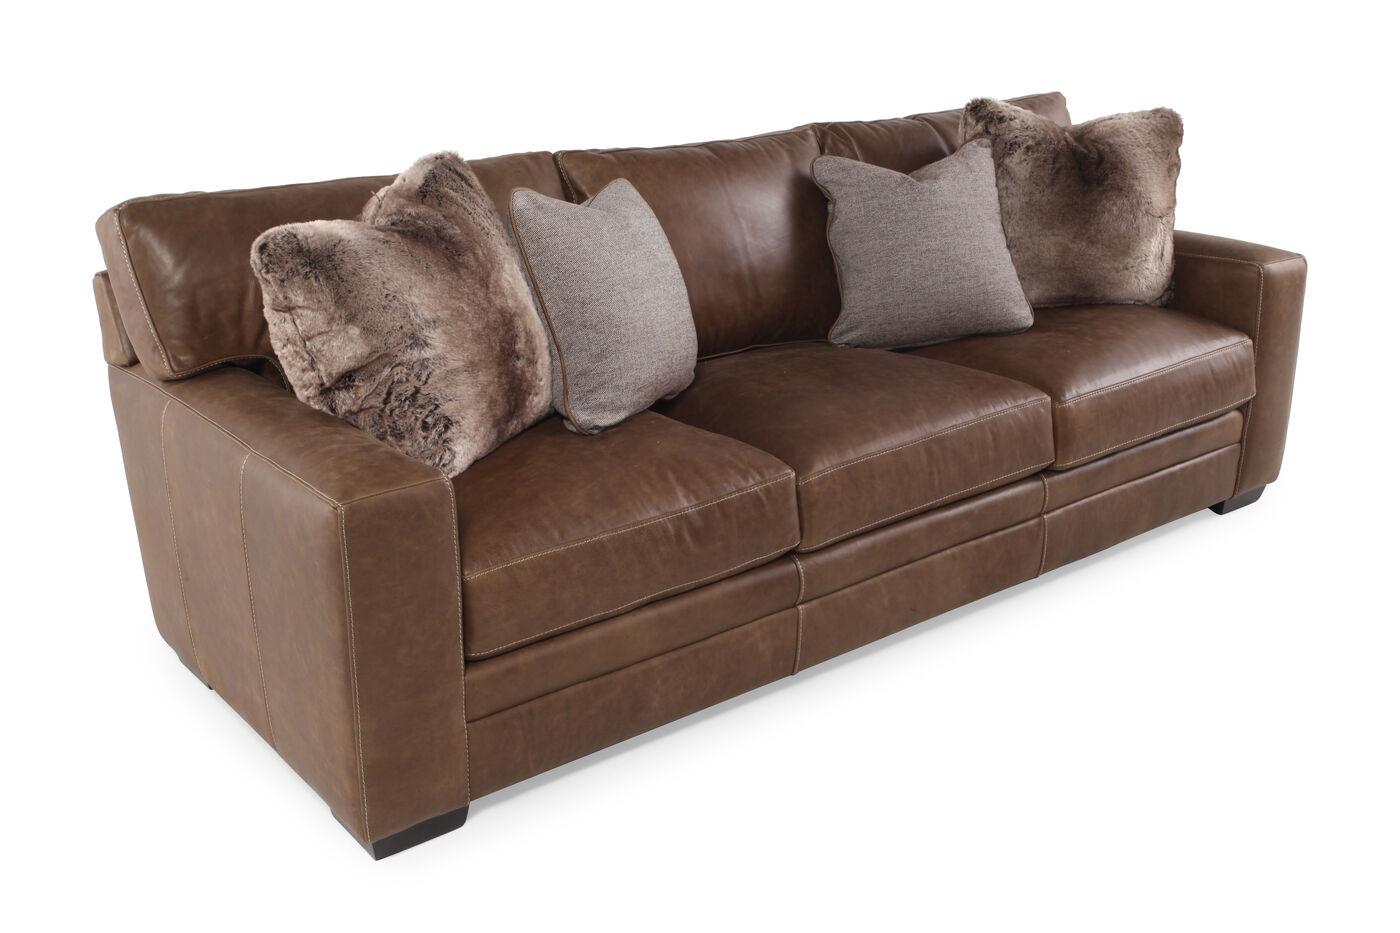 Bernhardt Tolbert Leather Sofa   Mathis Brothers Furniture